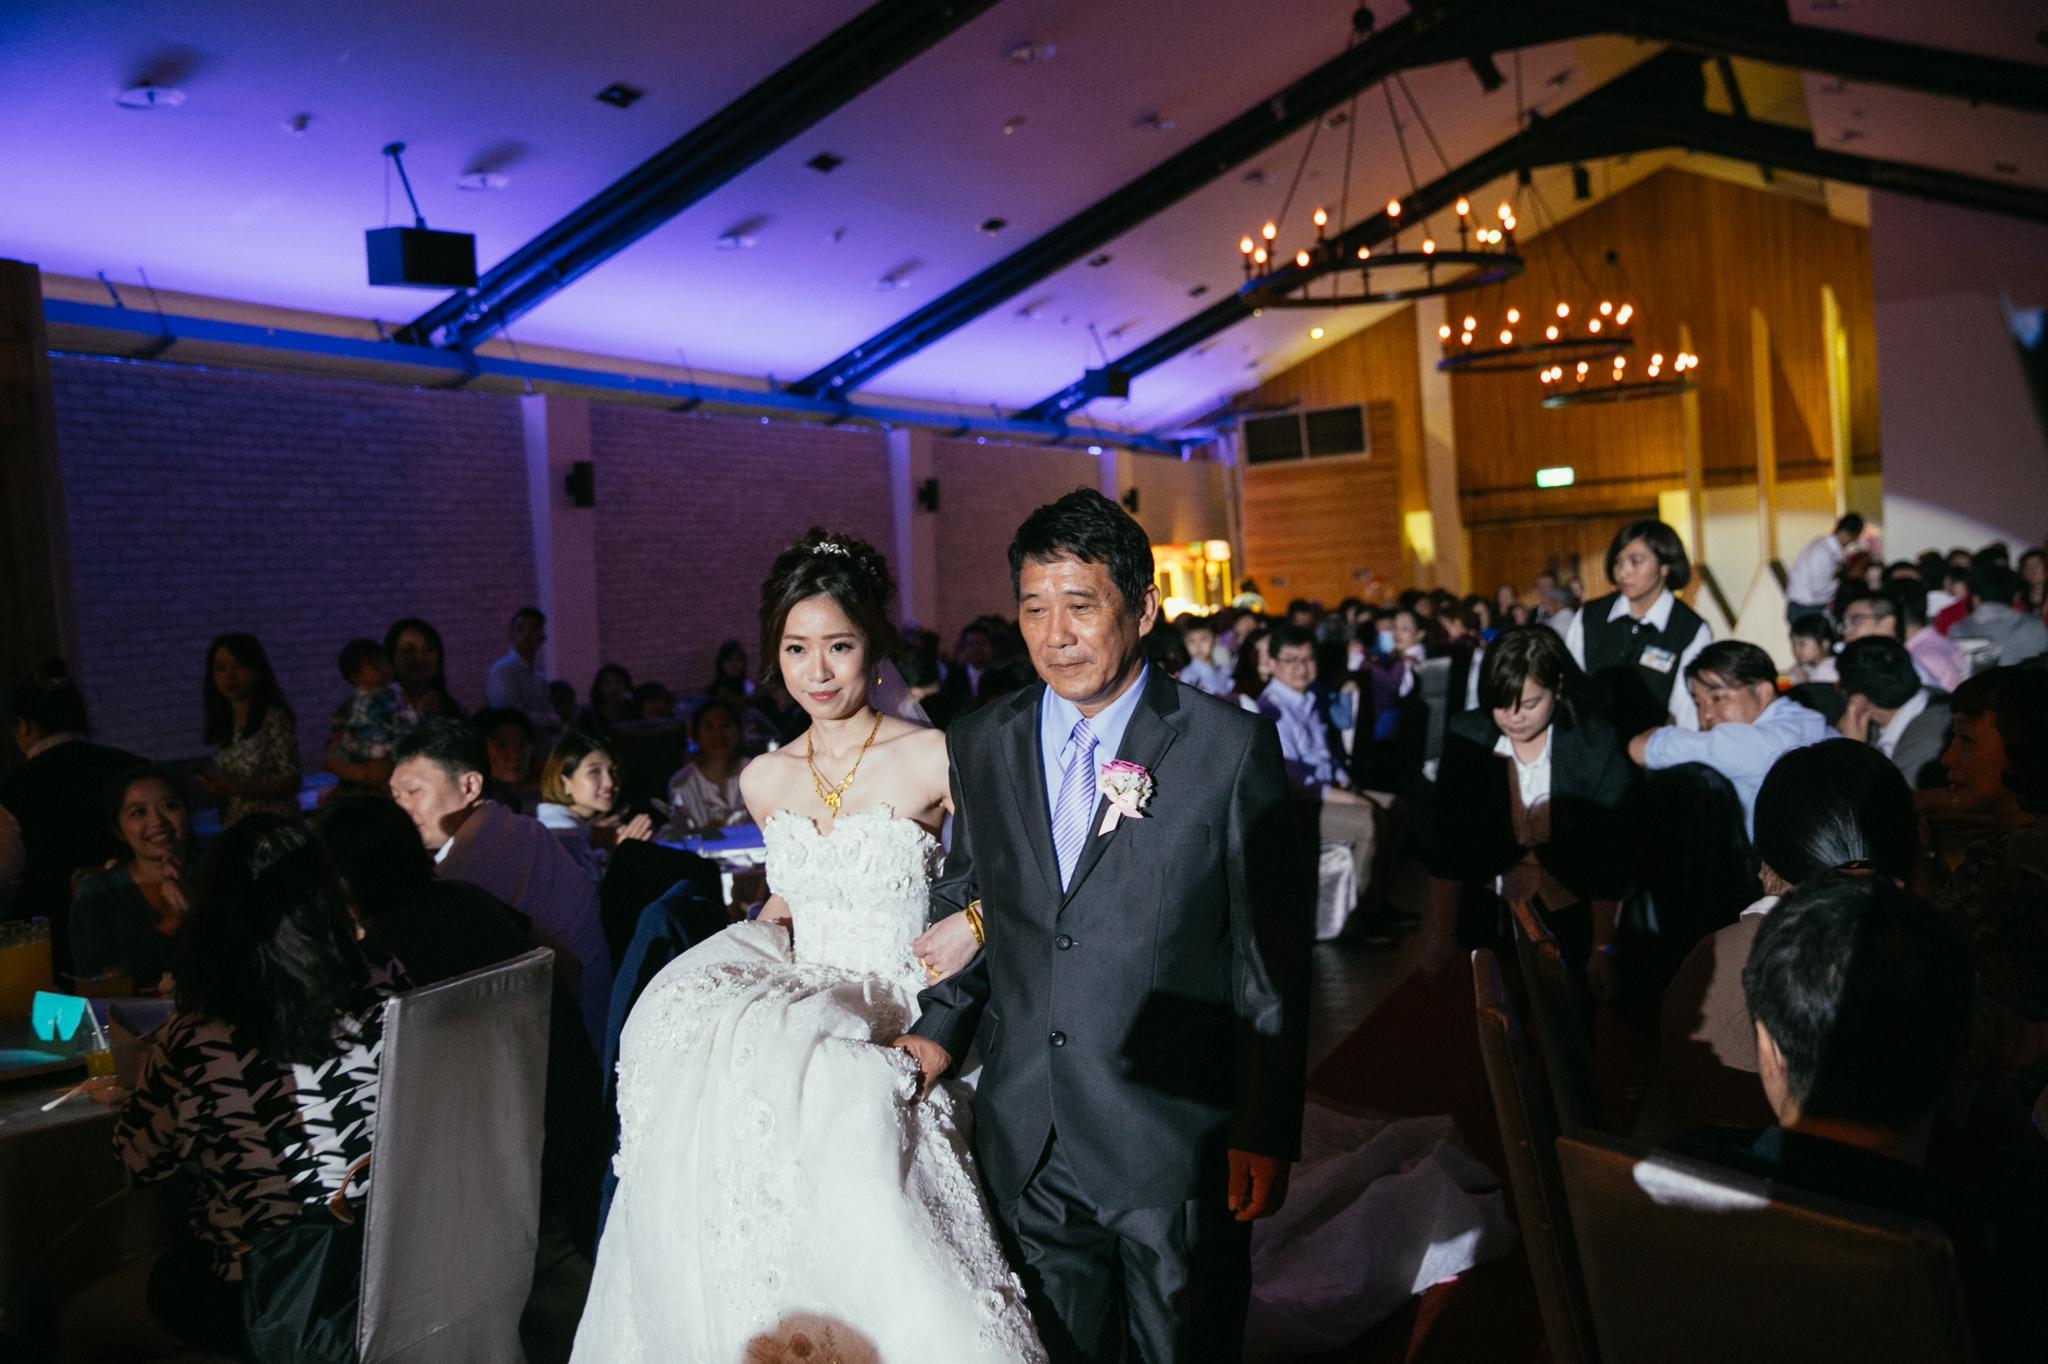 Tina+Nash-wedding-台北婚禮迎娶晚宴-新莊終身大事-121.jpg